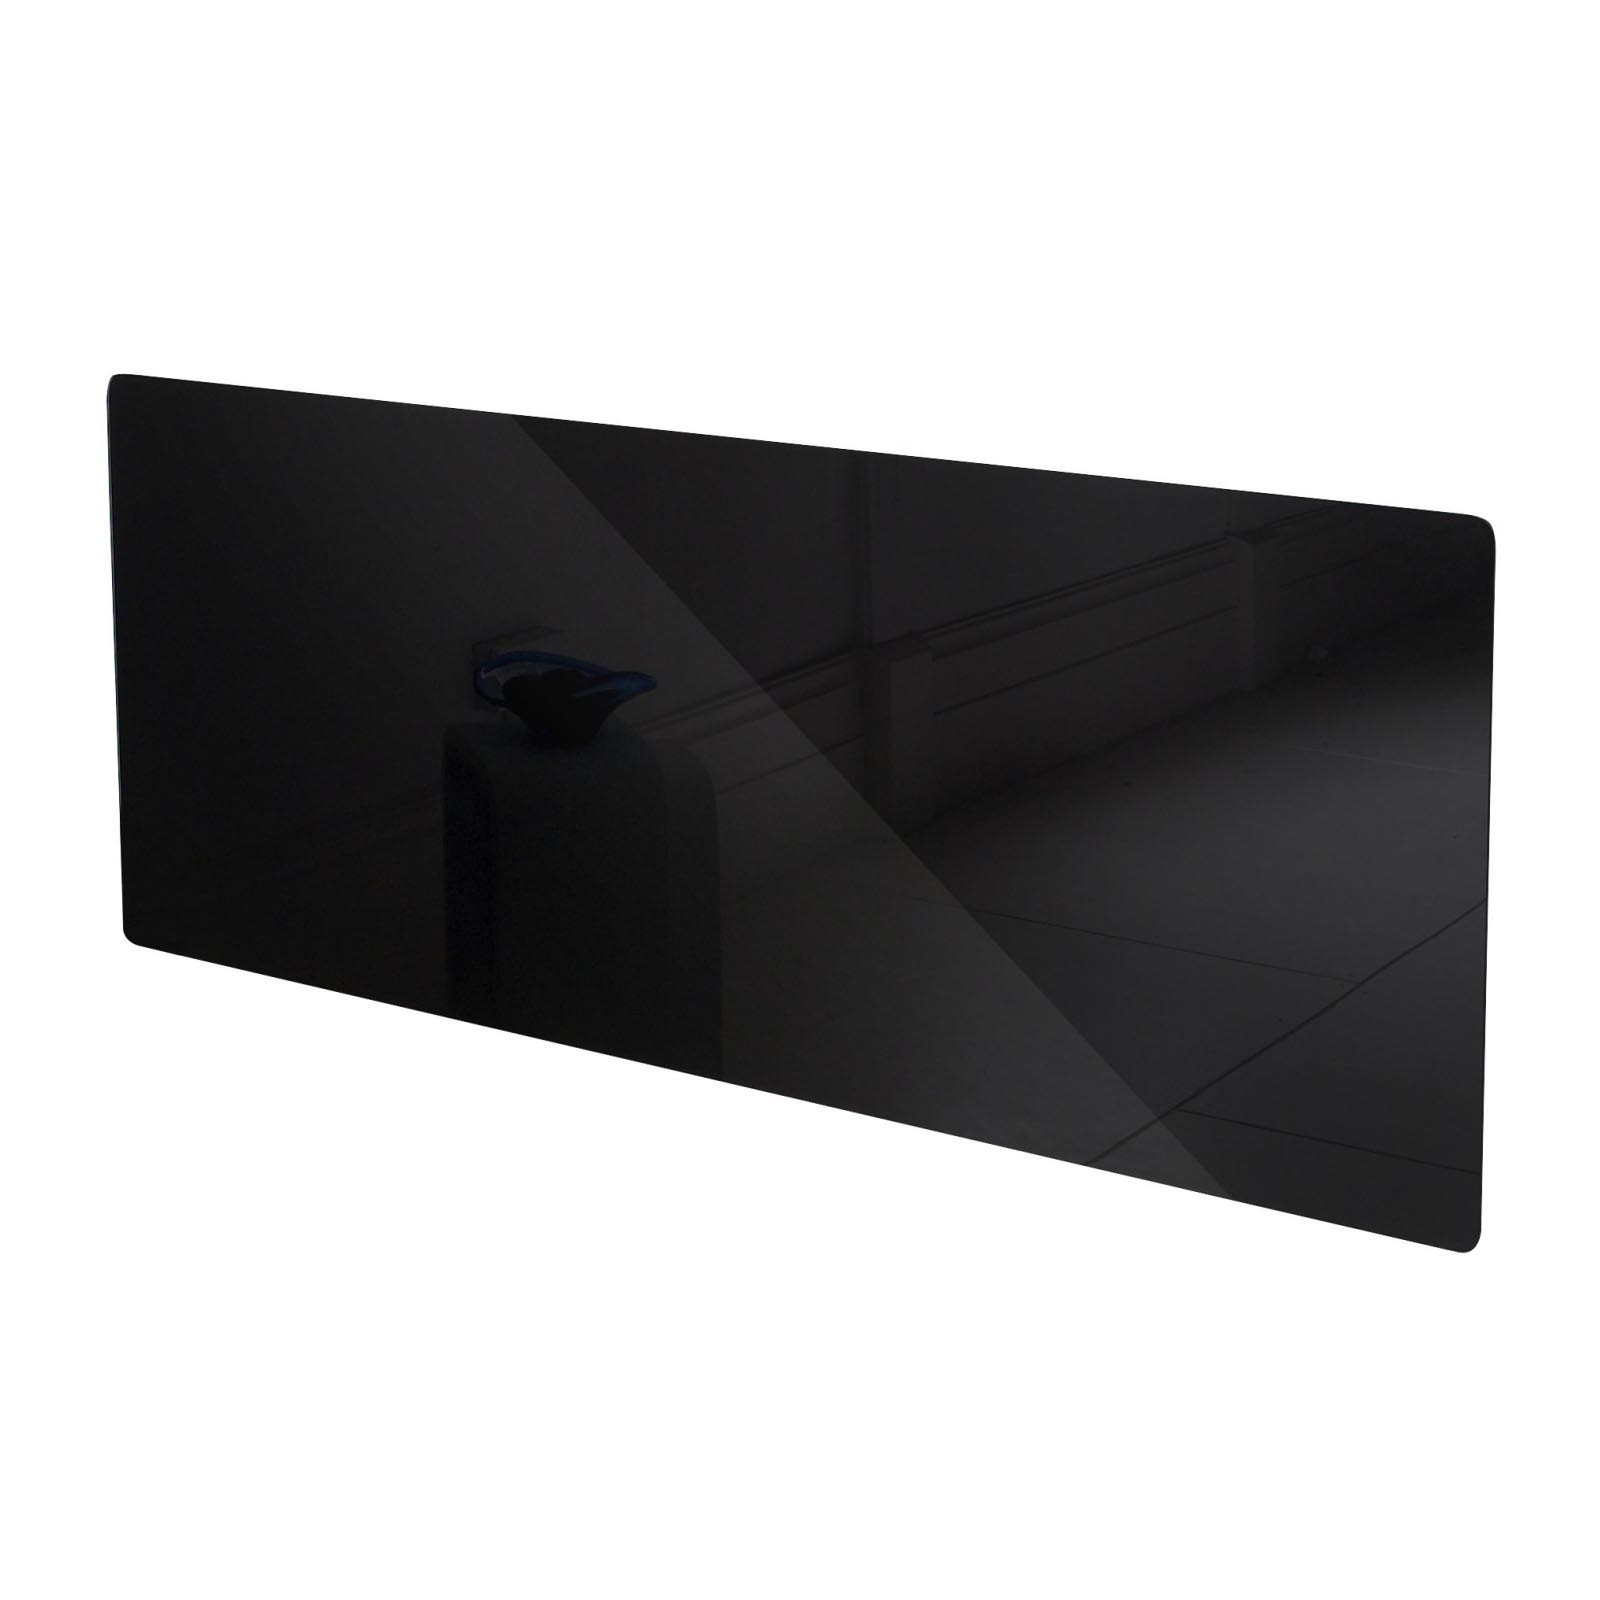 adam vitreo large black glass radiator cover - Black Glass